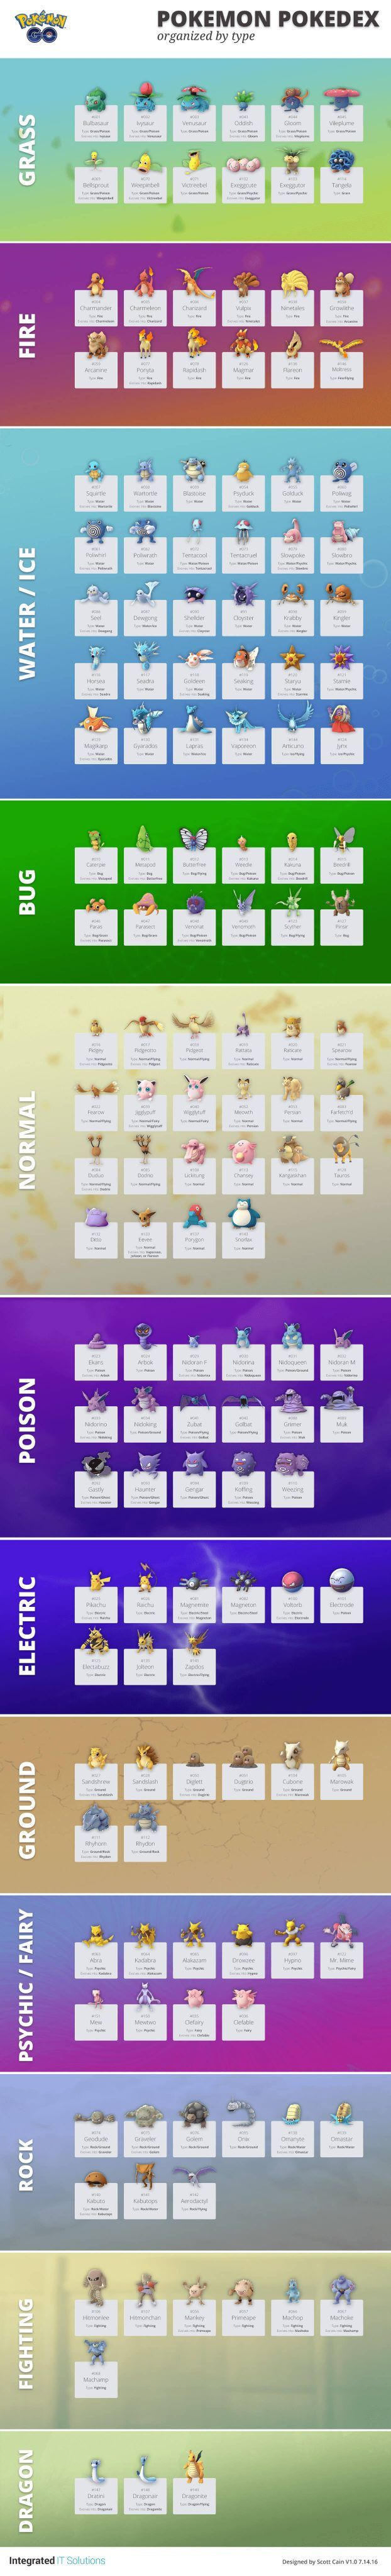 Pokemon GO Pokedex List Sorted by Type http://www.liveinfographic.com/i/pokemon-go-pokedex-list-sorted-by-type/ Tags: #infographic  #infographics #popular #pinterest #pinterestinfographics